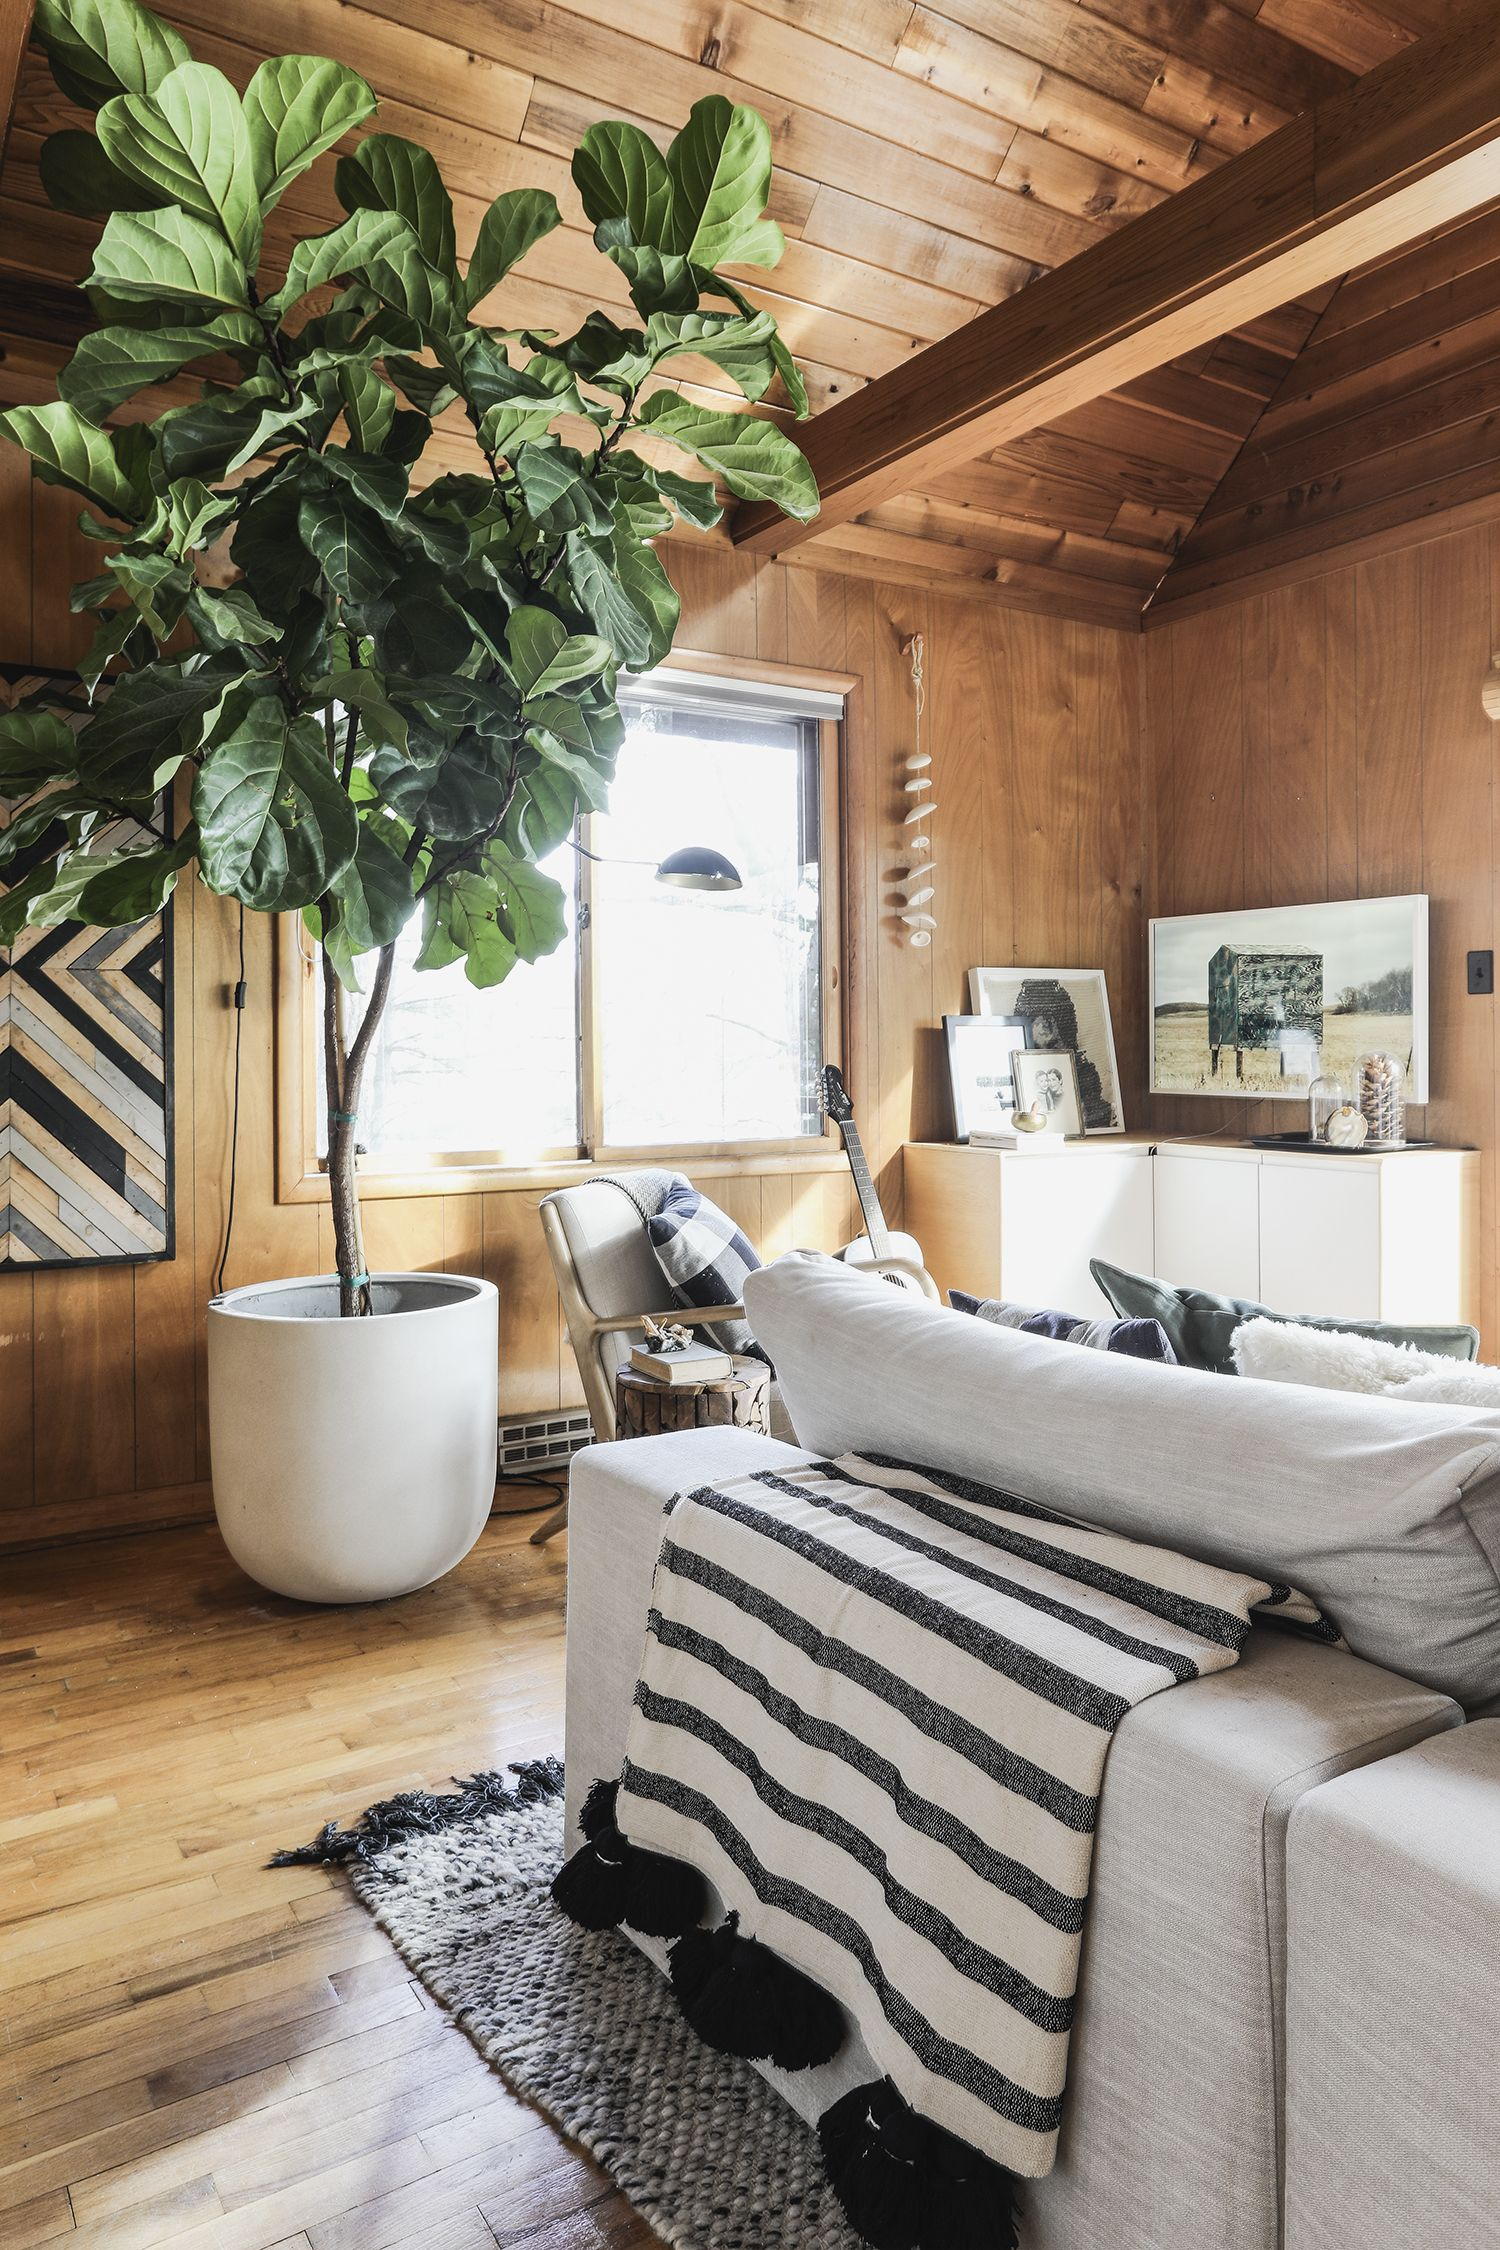 Photo of Three Years of Loving the Cabin – Deuce Cities Henhouse